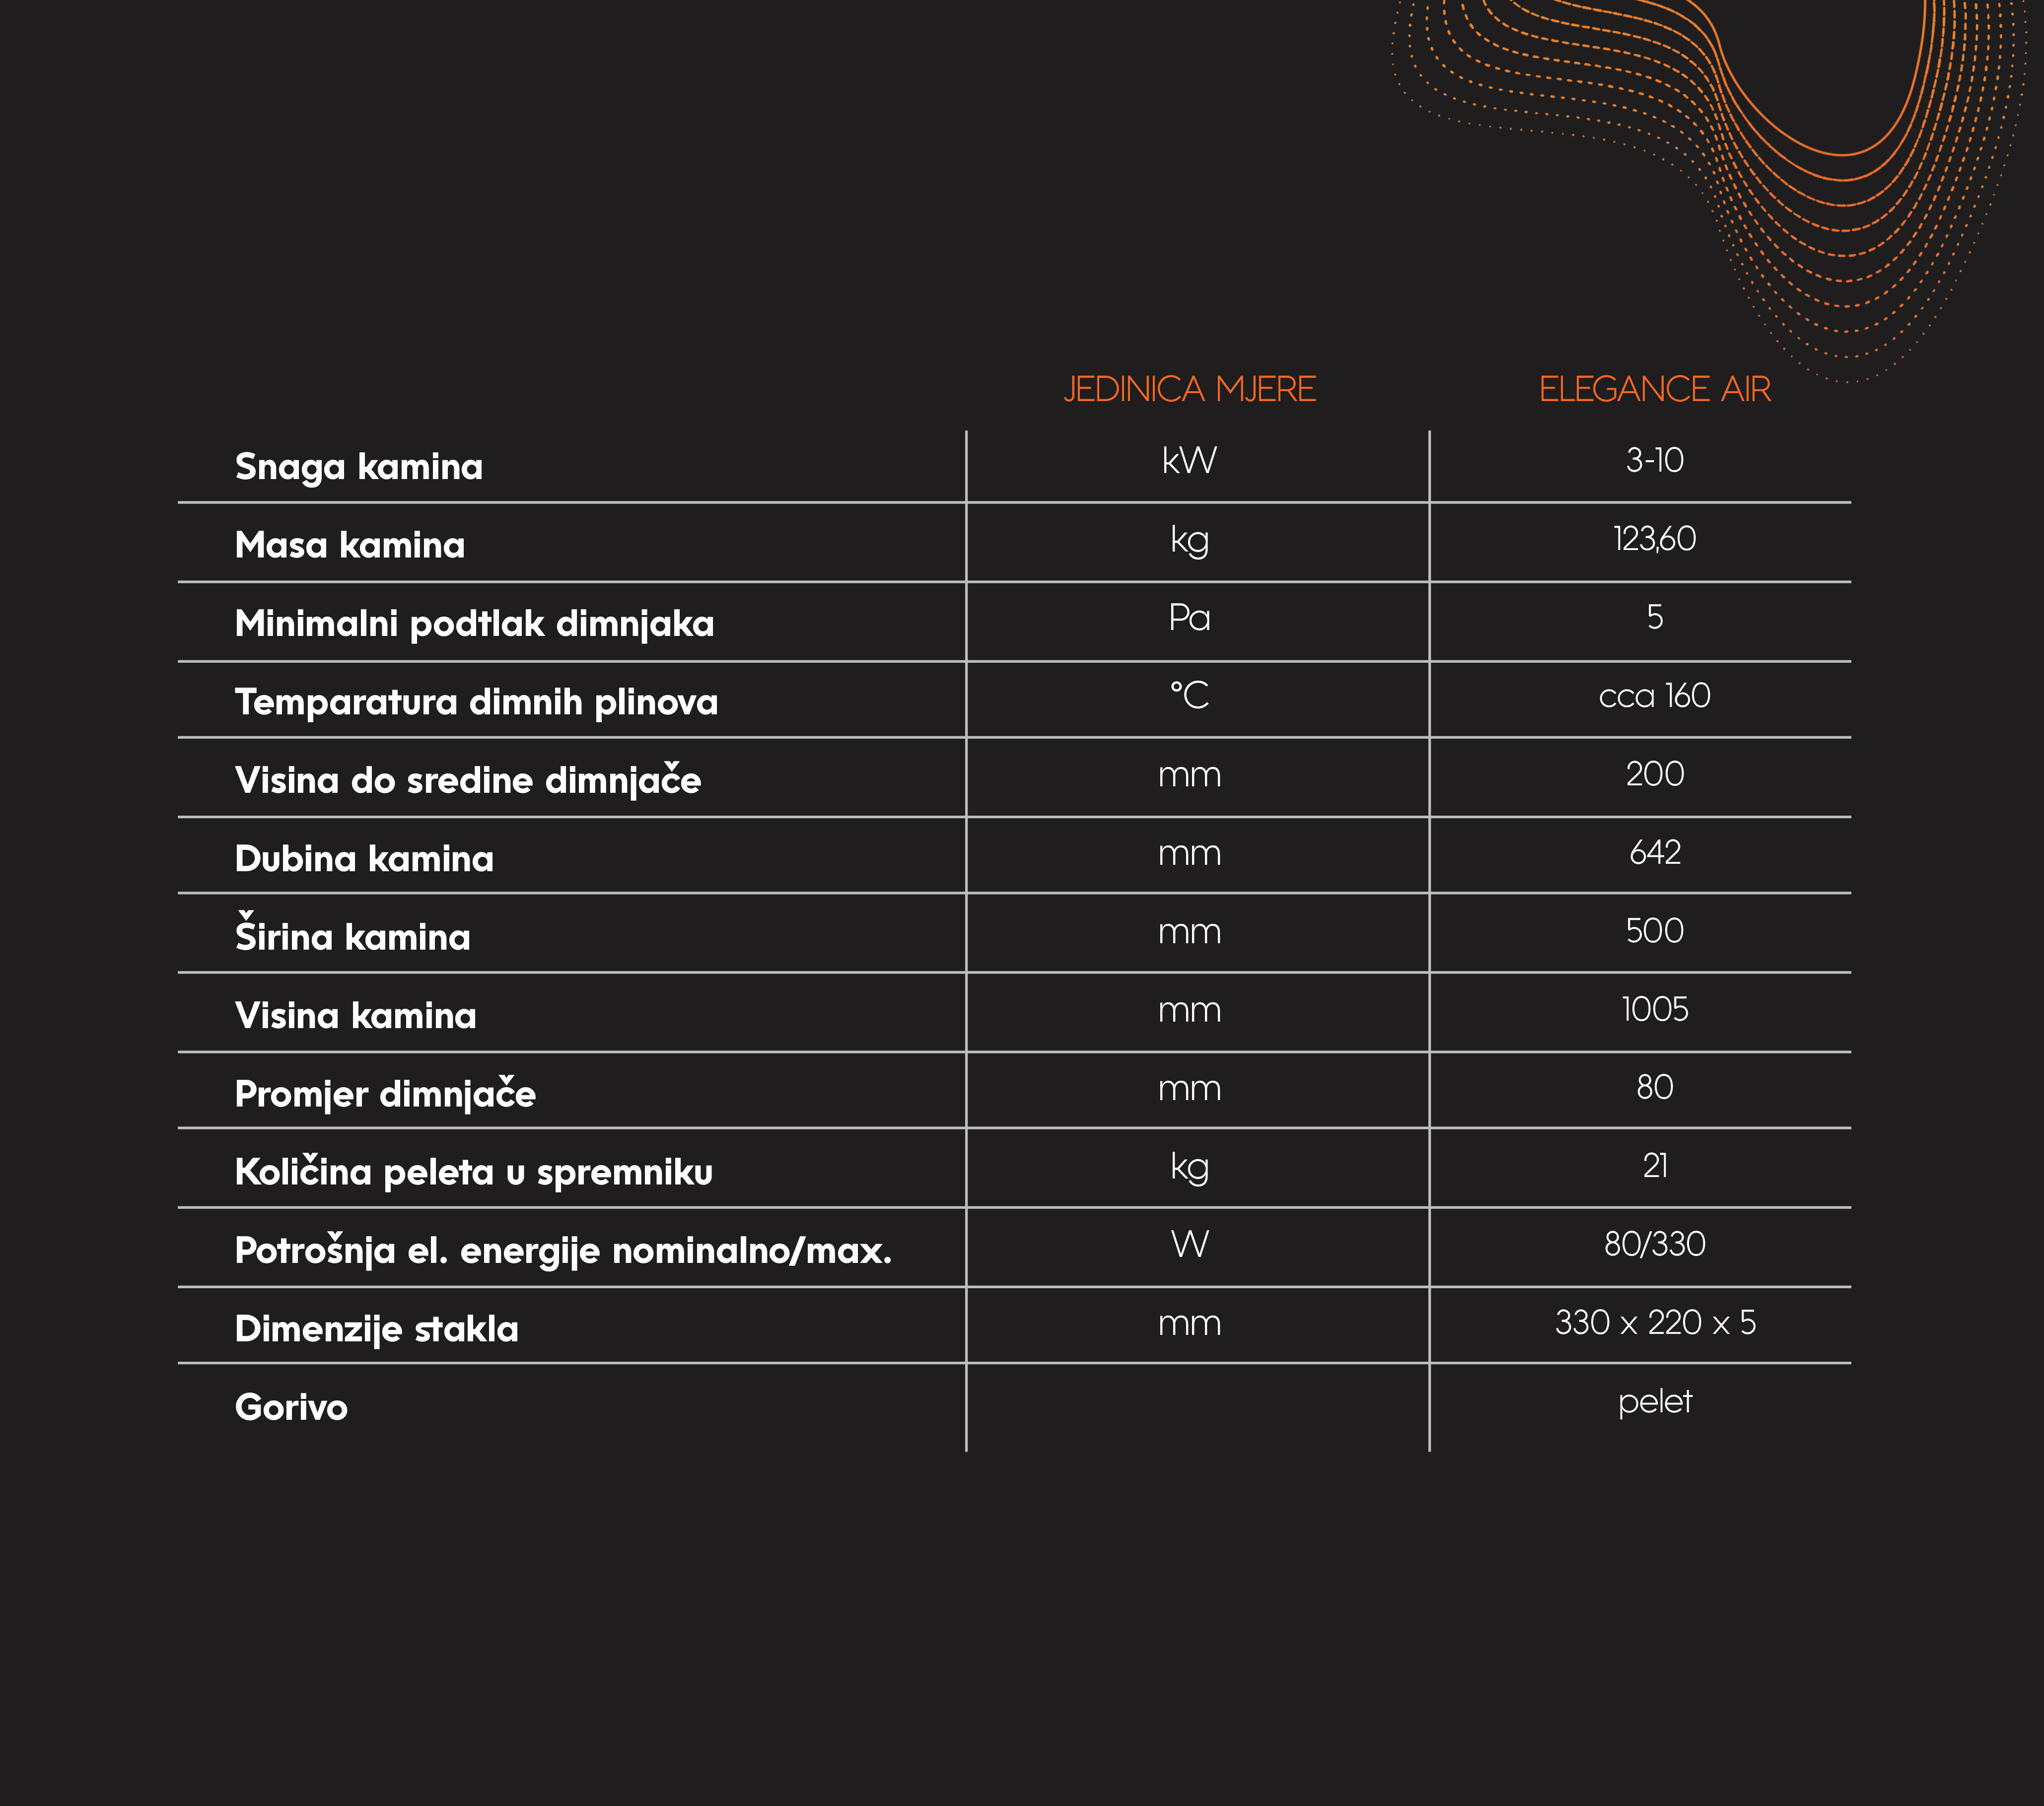 tabela_elegance_air_new